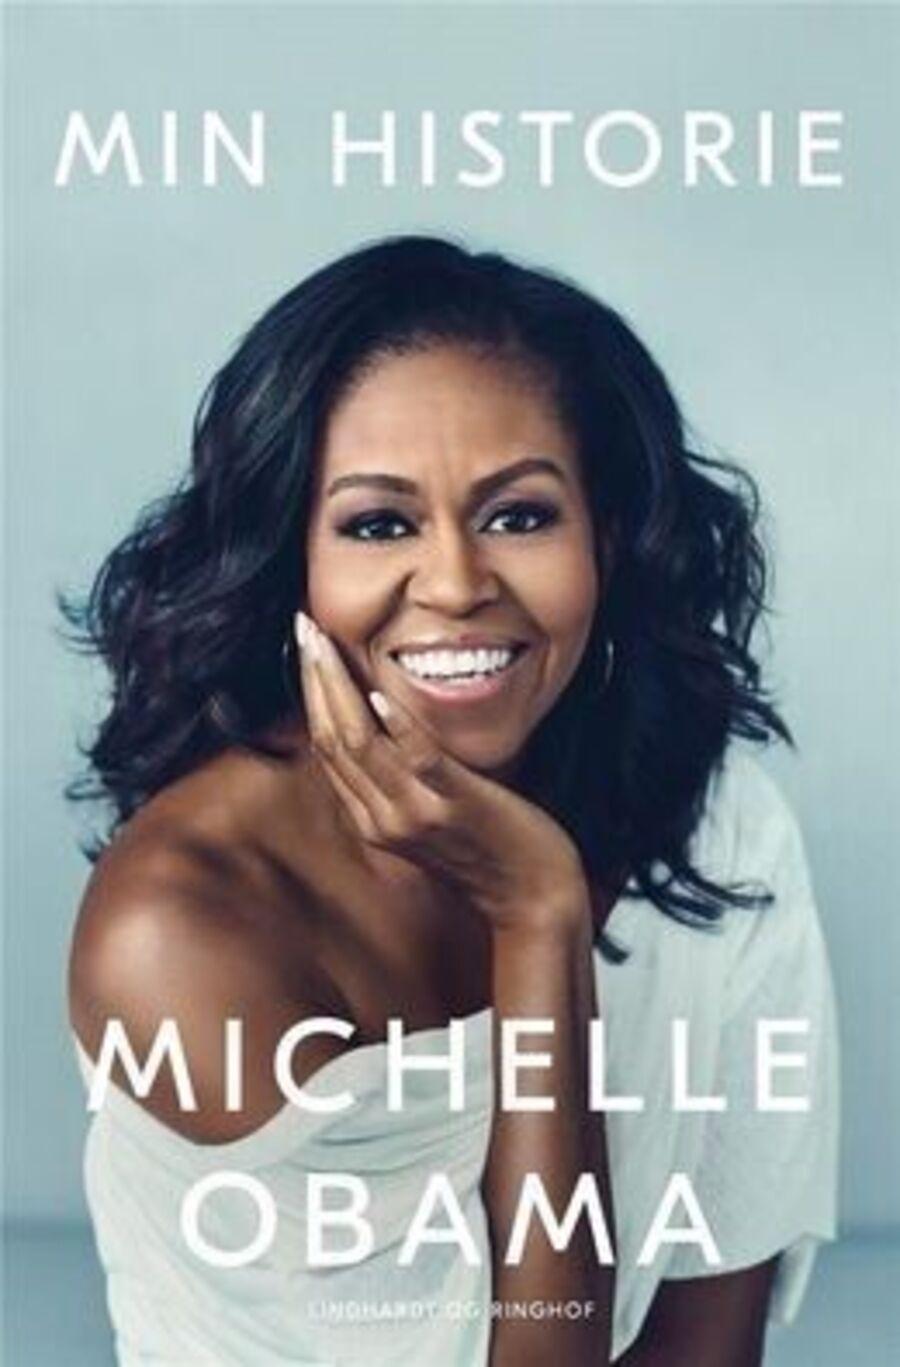 Michelle Obama - Min historie